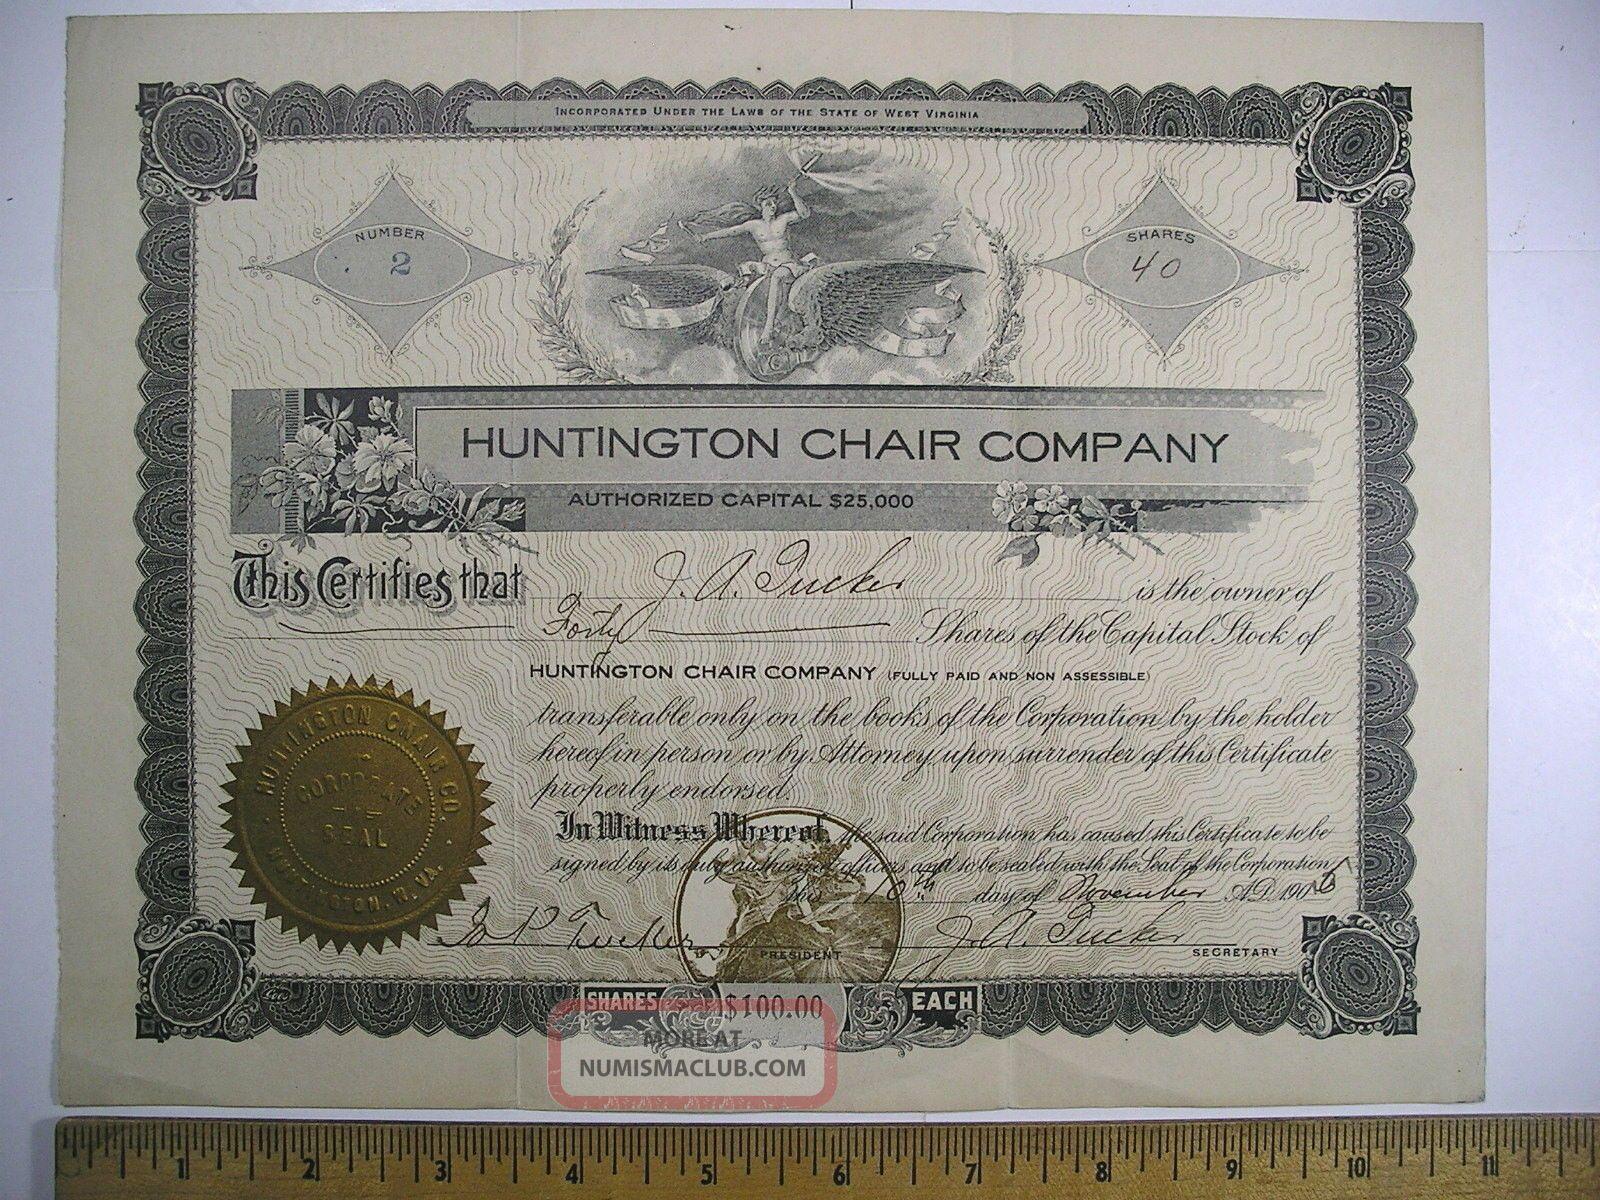 1905 Stock Cert No.  2 Huntington Chair Company Huntington,  Wv 40 Shares Stocks & Bonds, Scripophily photo